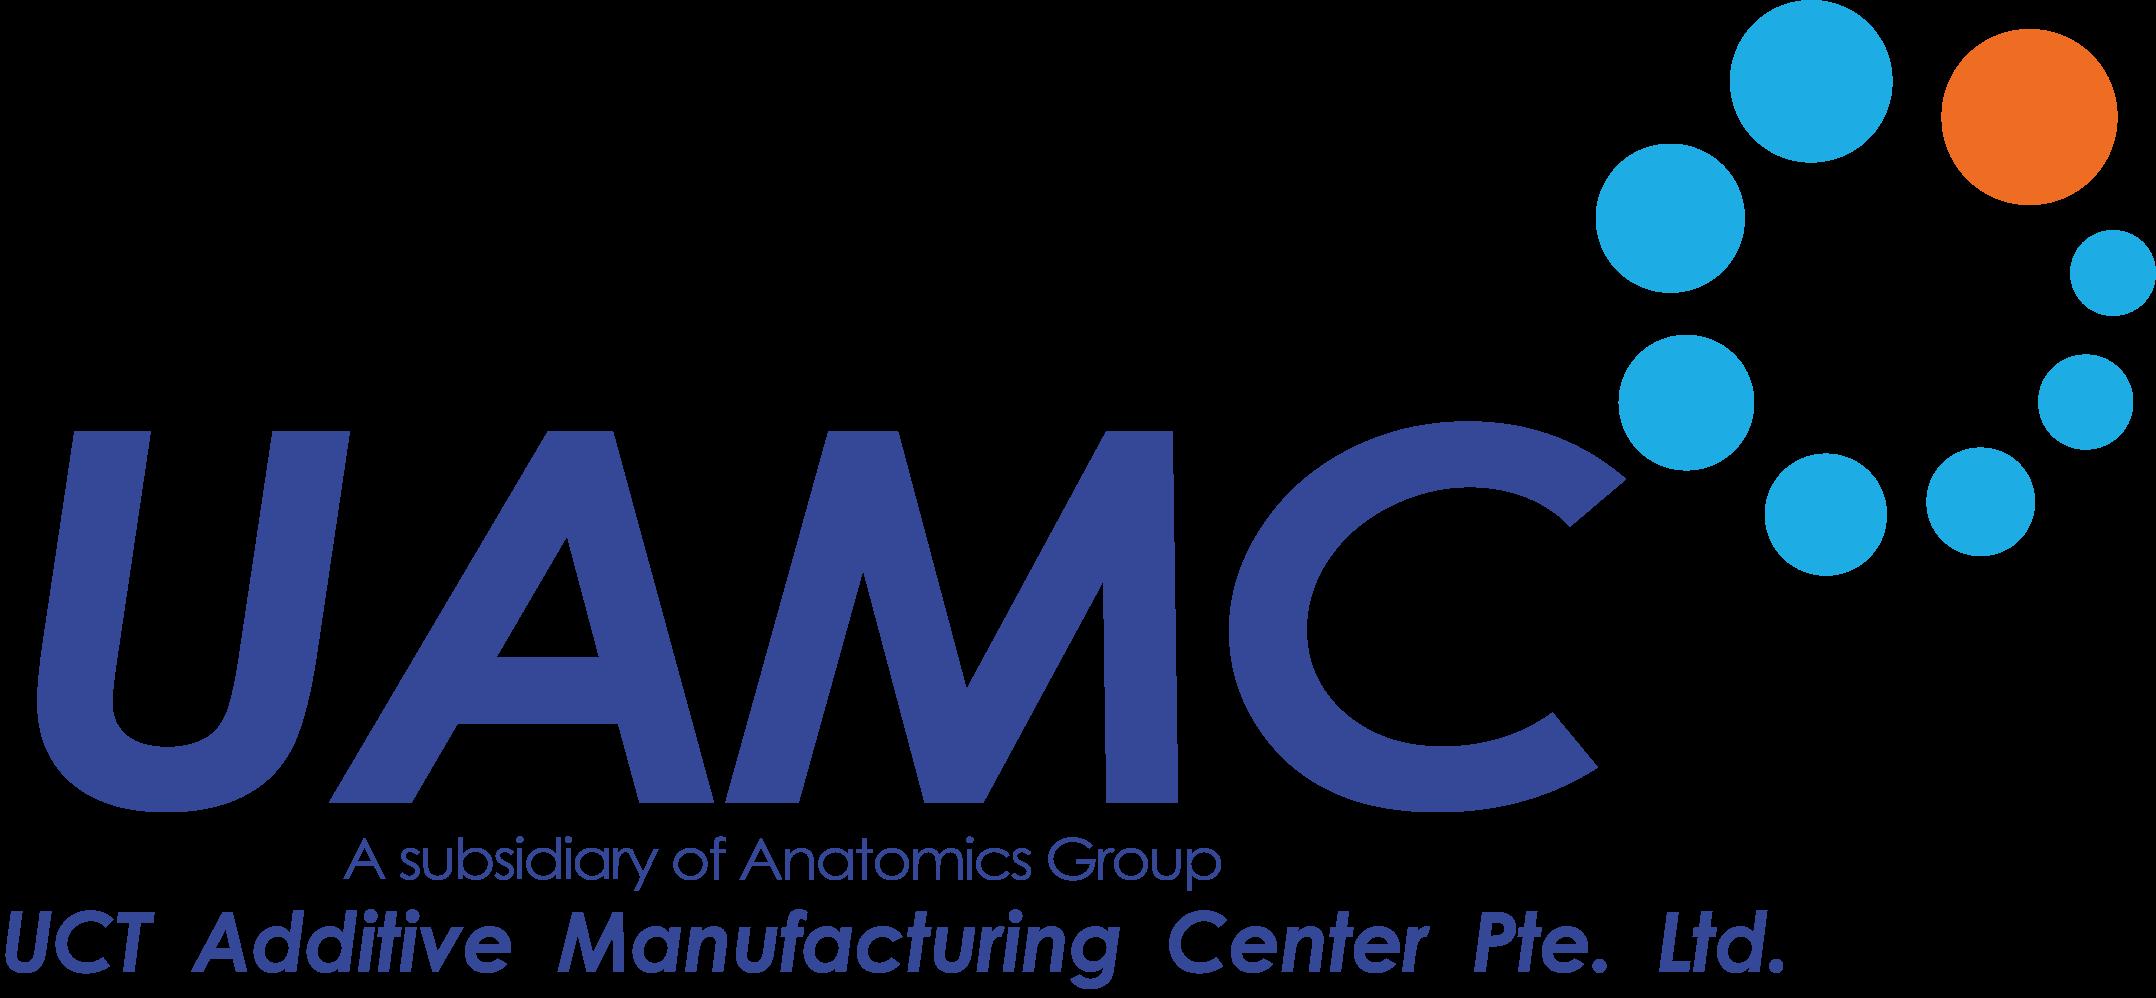 UAMC logo + UCTAMC V2